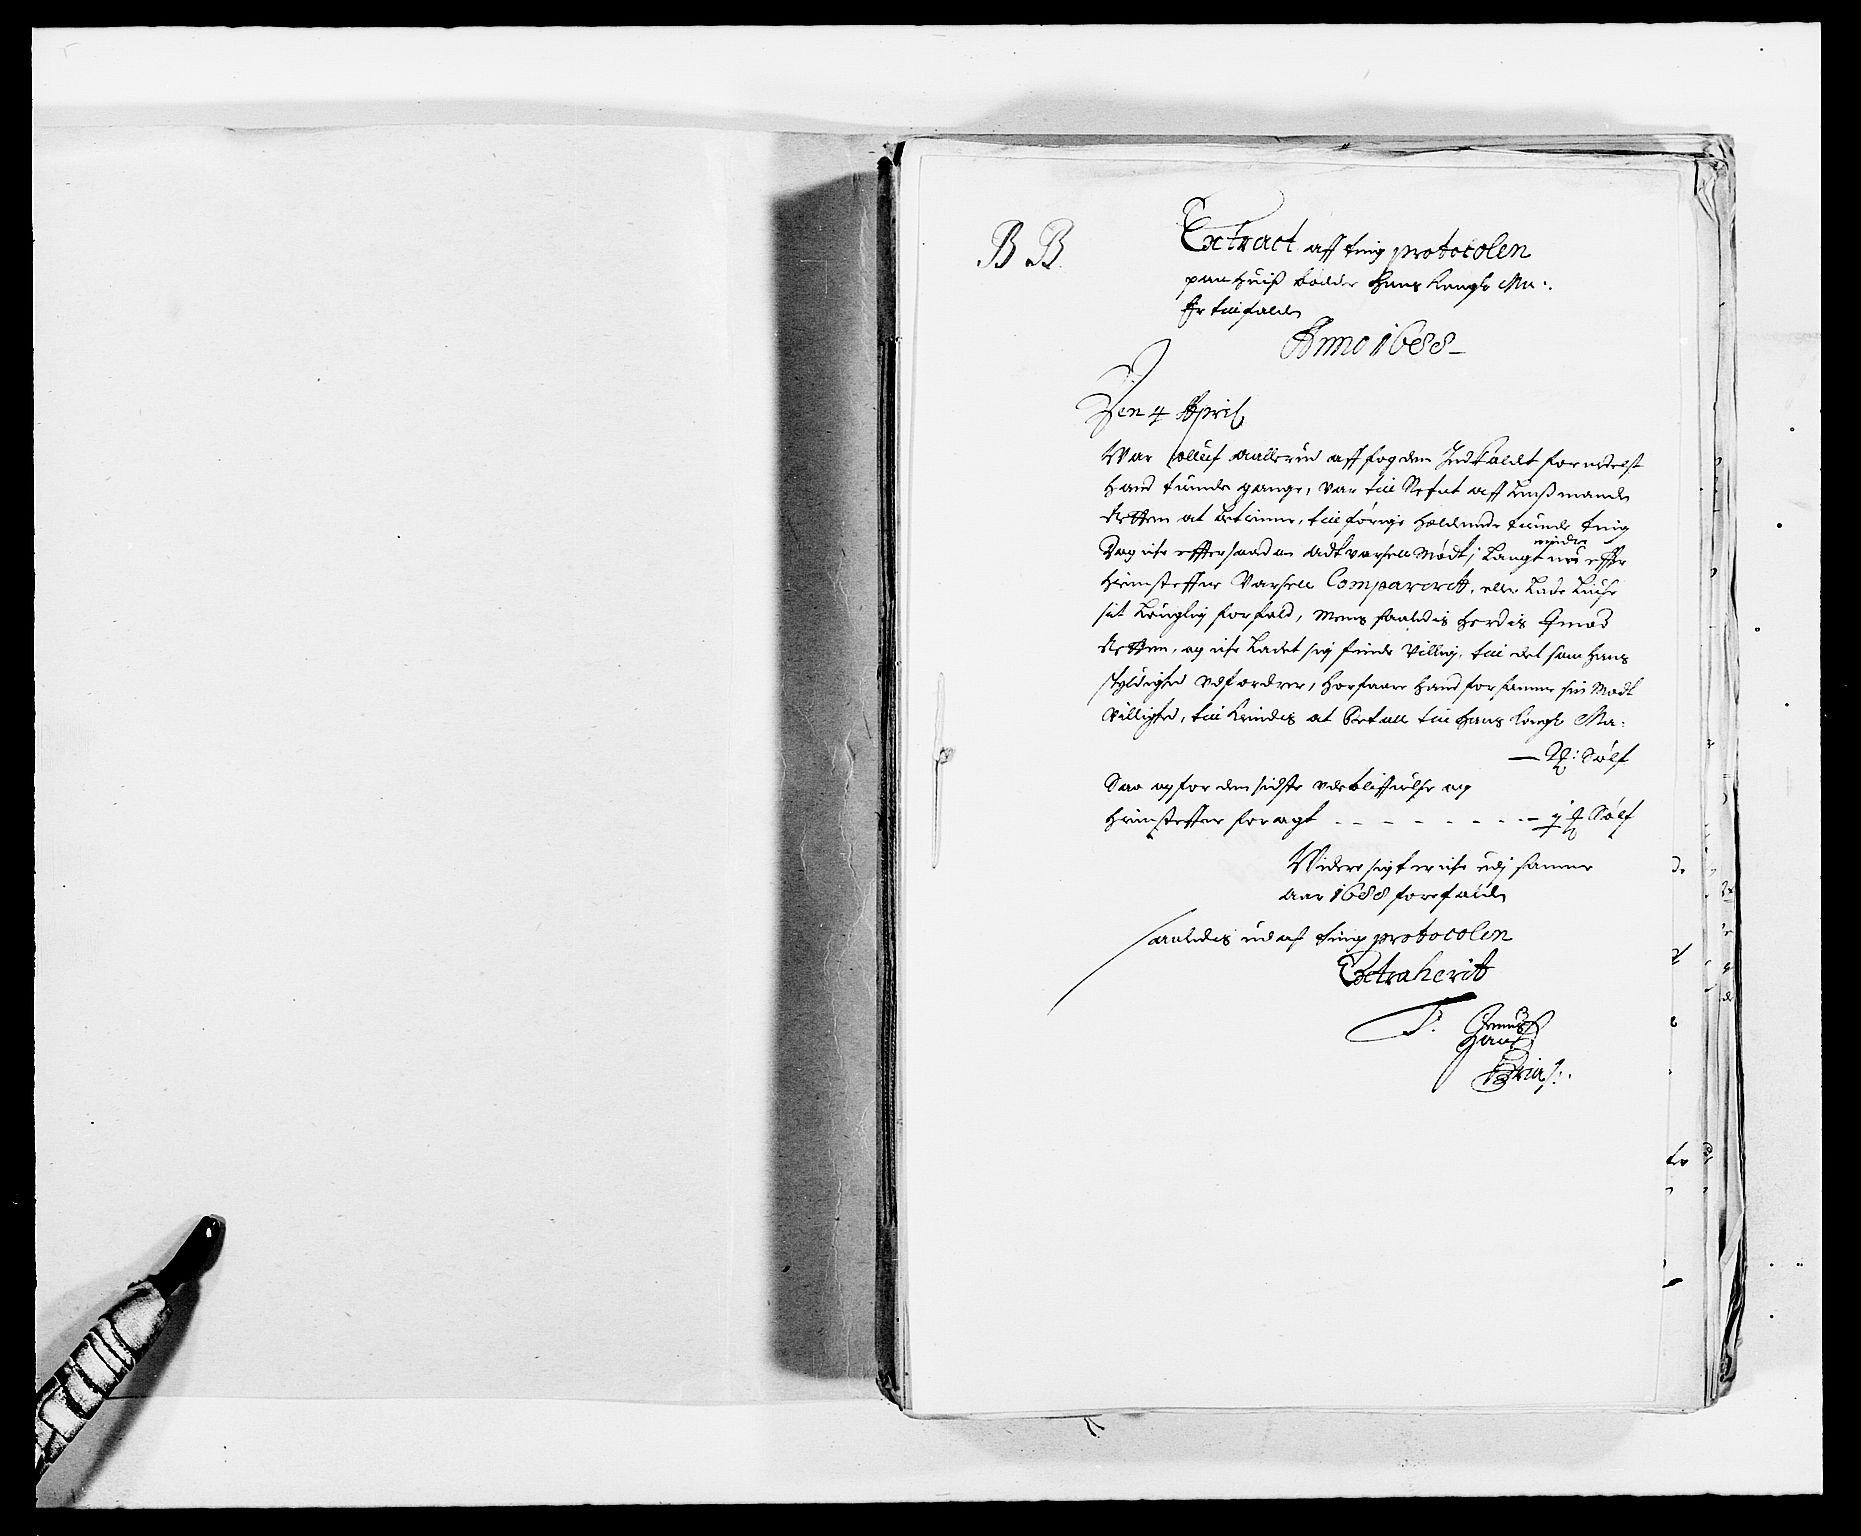 RA, Rentekammeret inntil 1814, Reviderte regnskaper, Fogderegnskap, R09/L0434: Fogderegnskap Follo, 1687-1688, s. 202